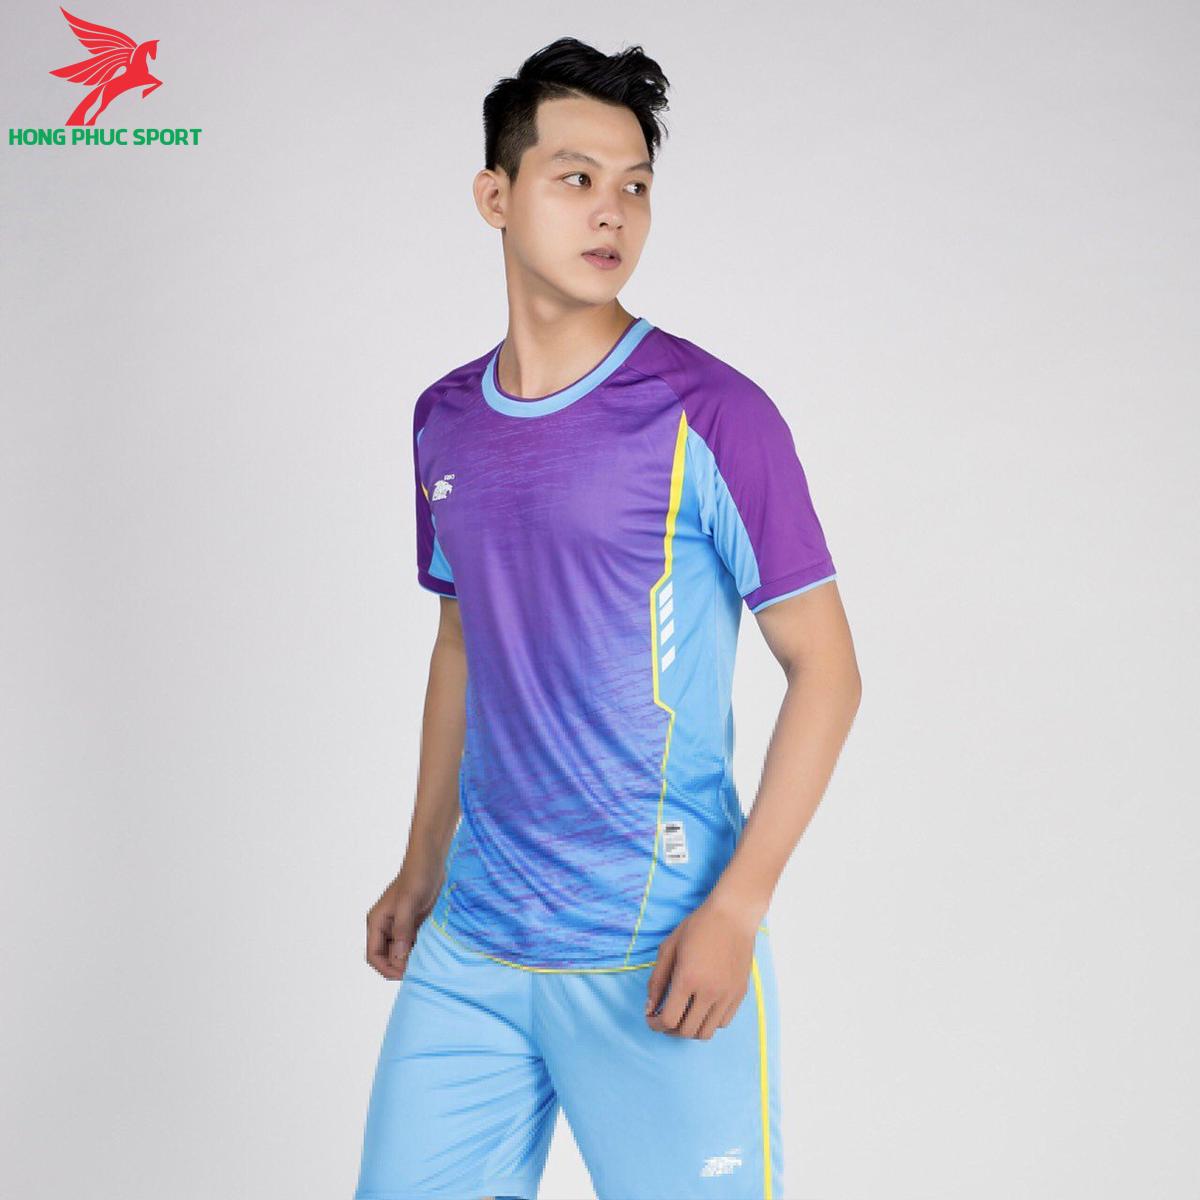 https://cdn.hongphucsport.com/unsafe/s4.shopbay.vn/files/285/ao-khong-logo-riki-grambor-xanh-da-troi-603e19509955d.png